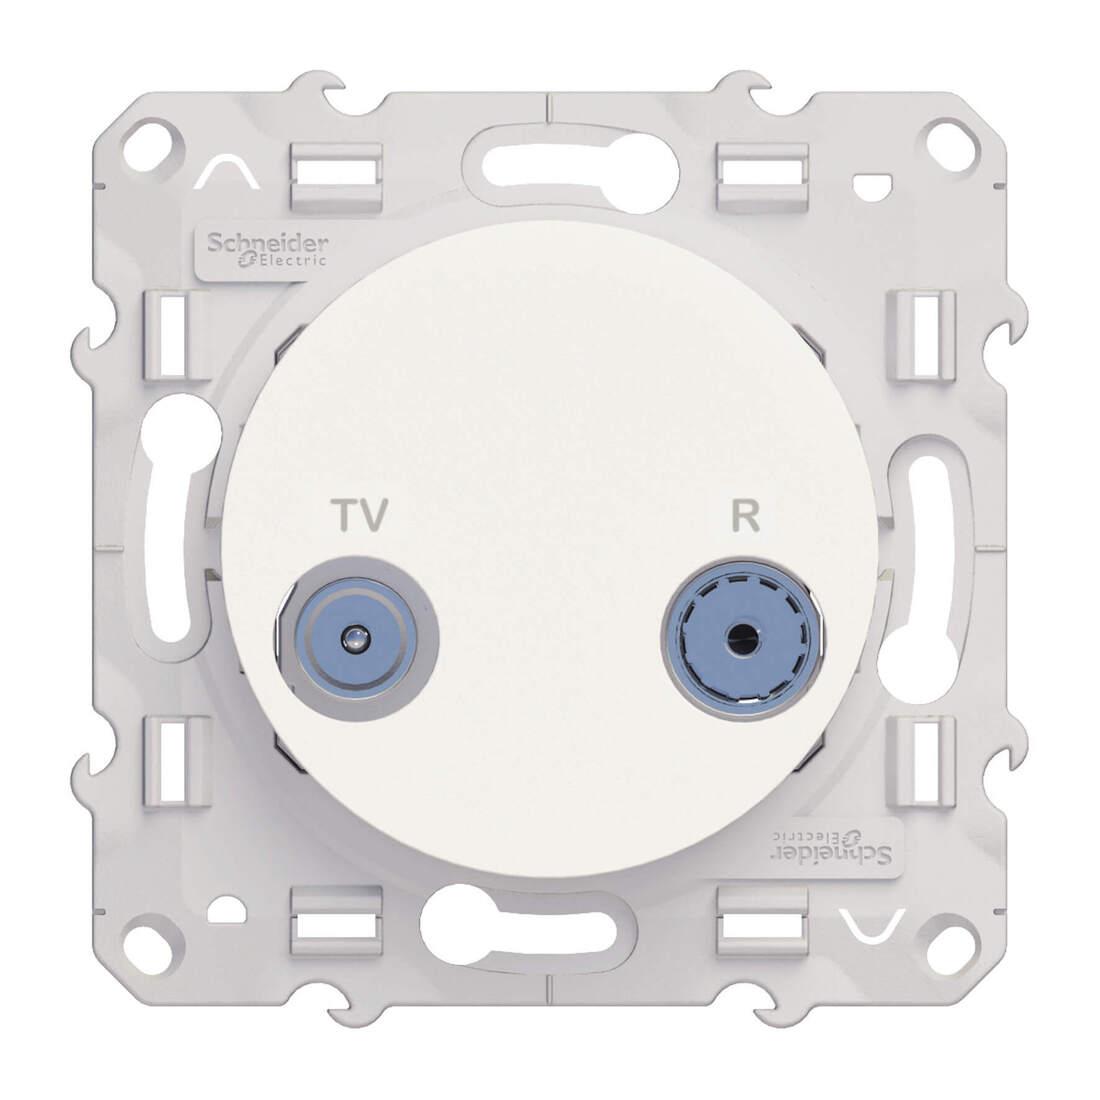 Schneider Electric Odace TV / rijgdoos - wit (S520453)